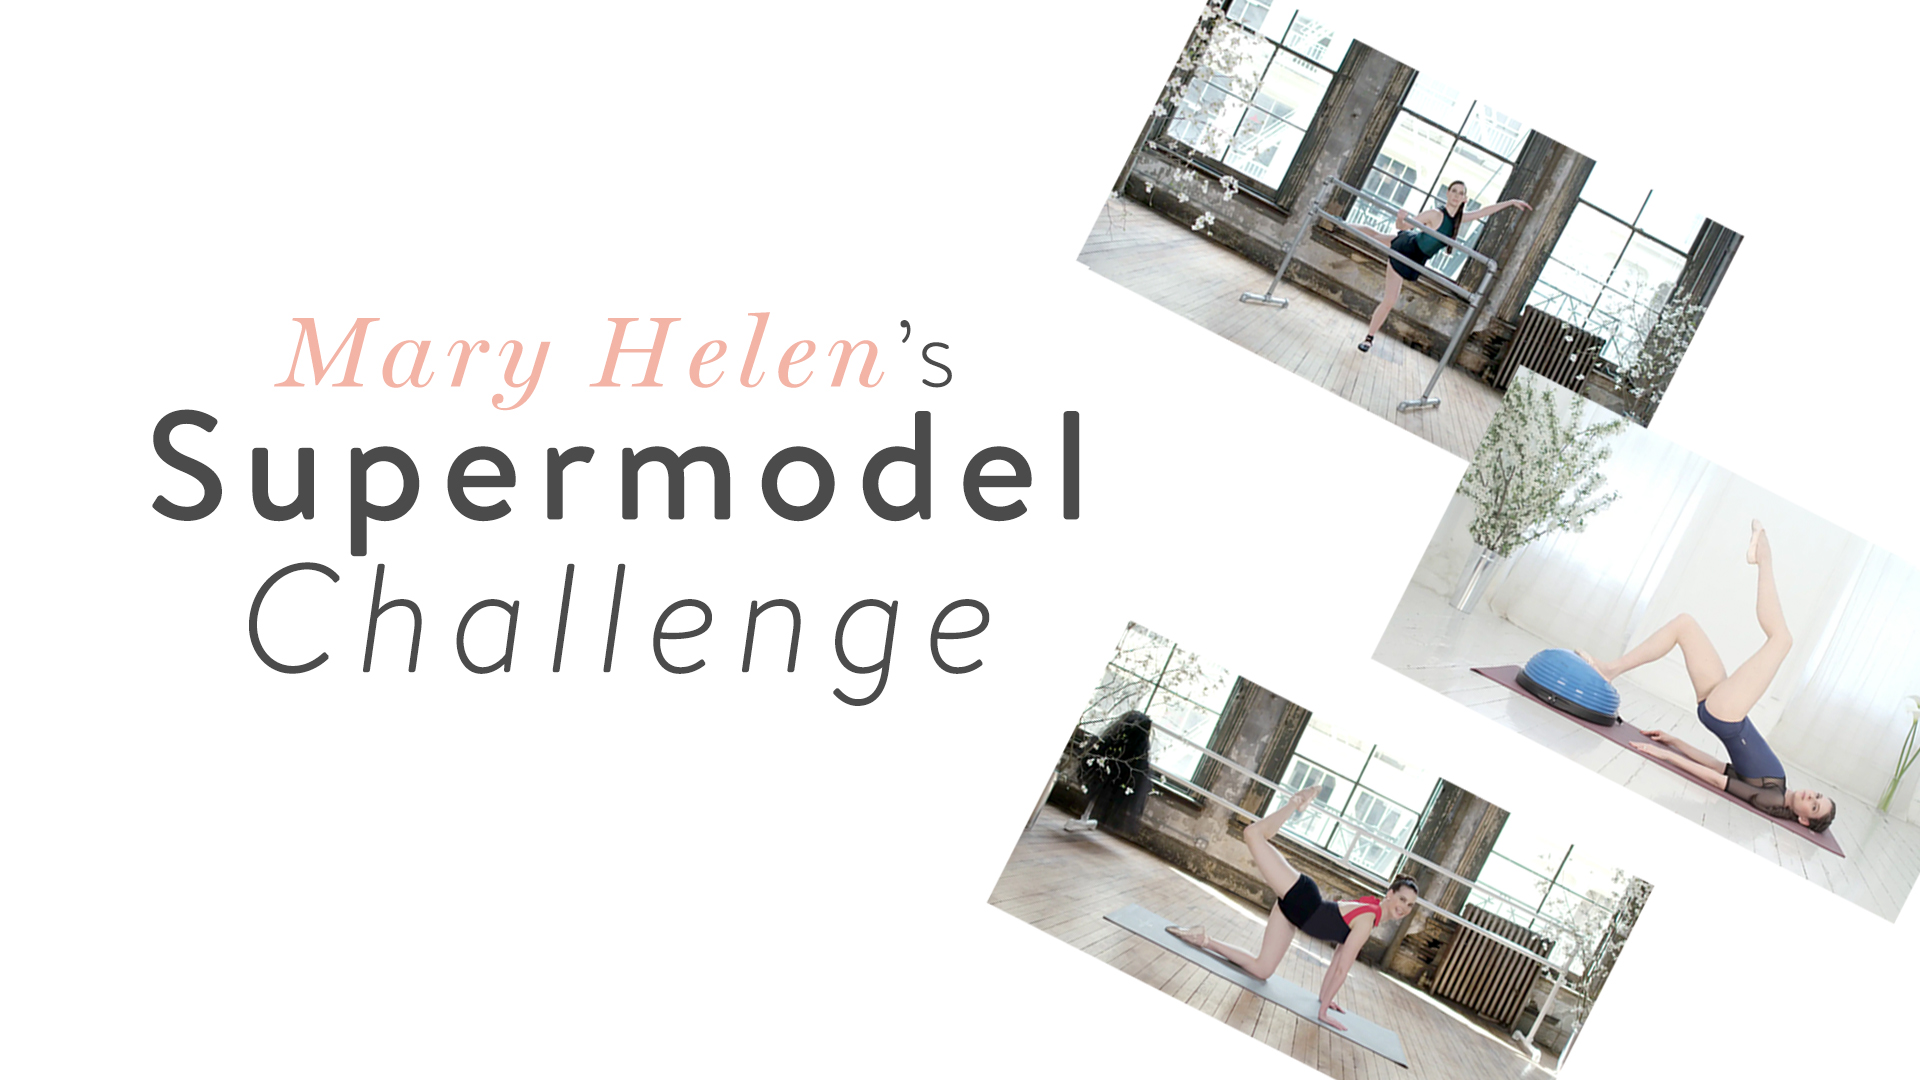 Mary Helen's Supermodel Challenge